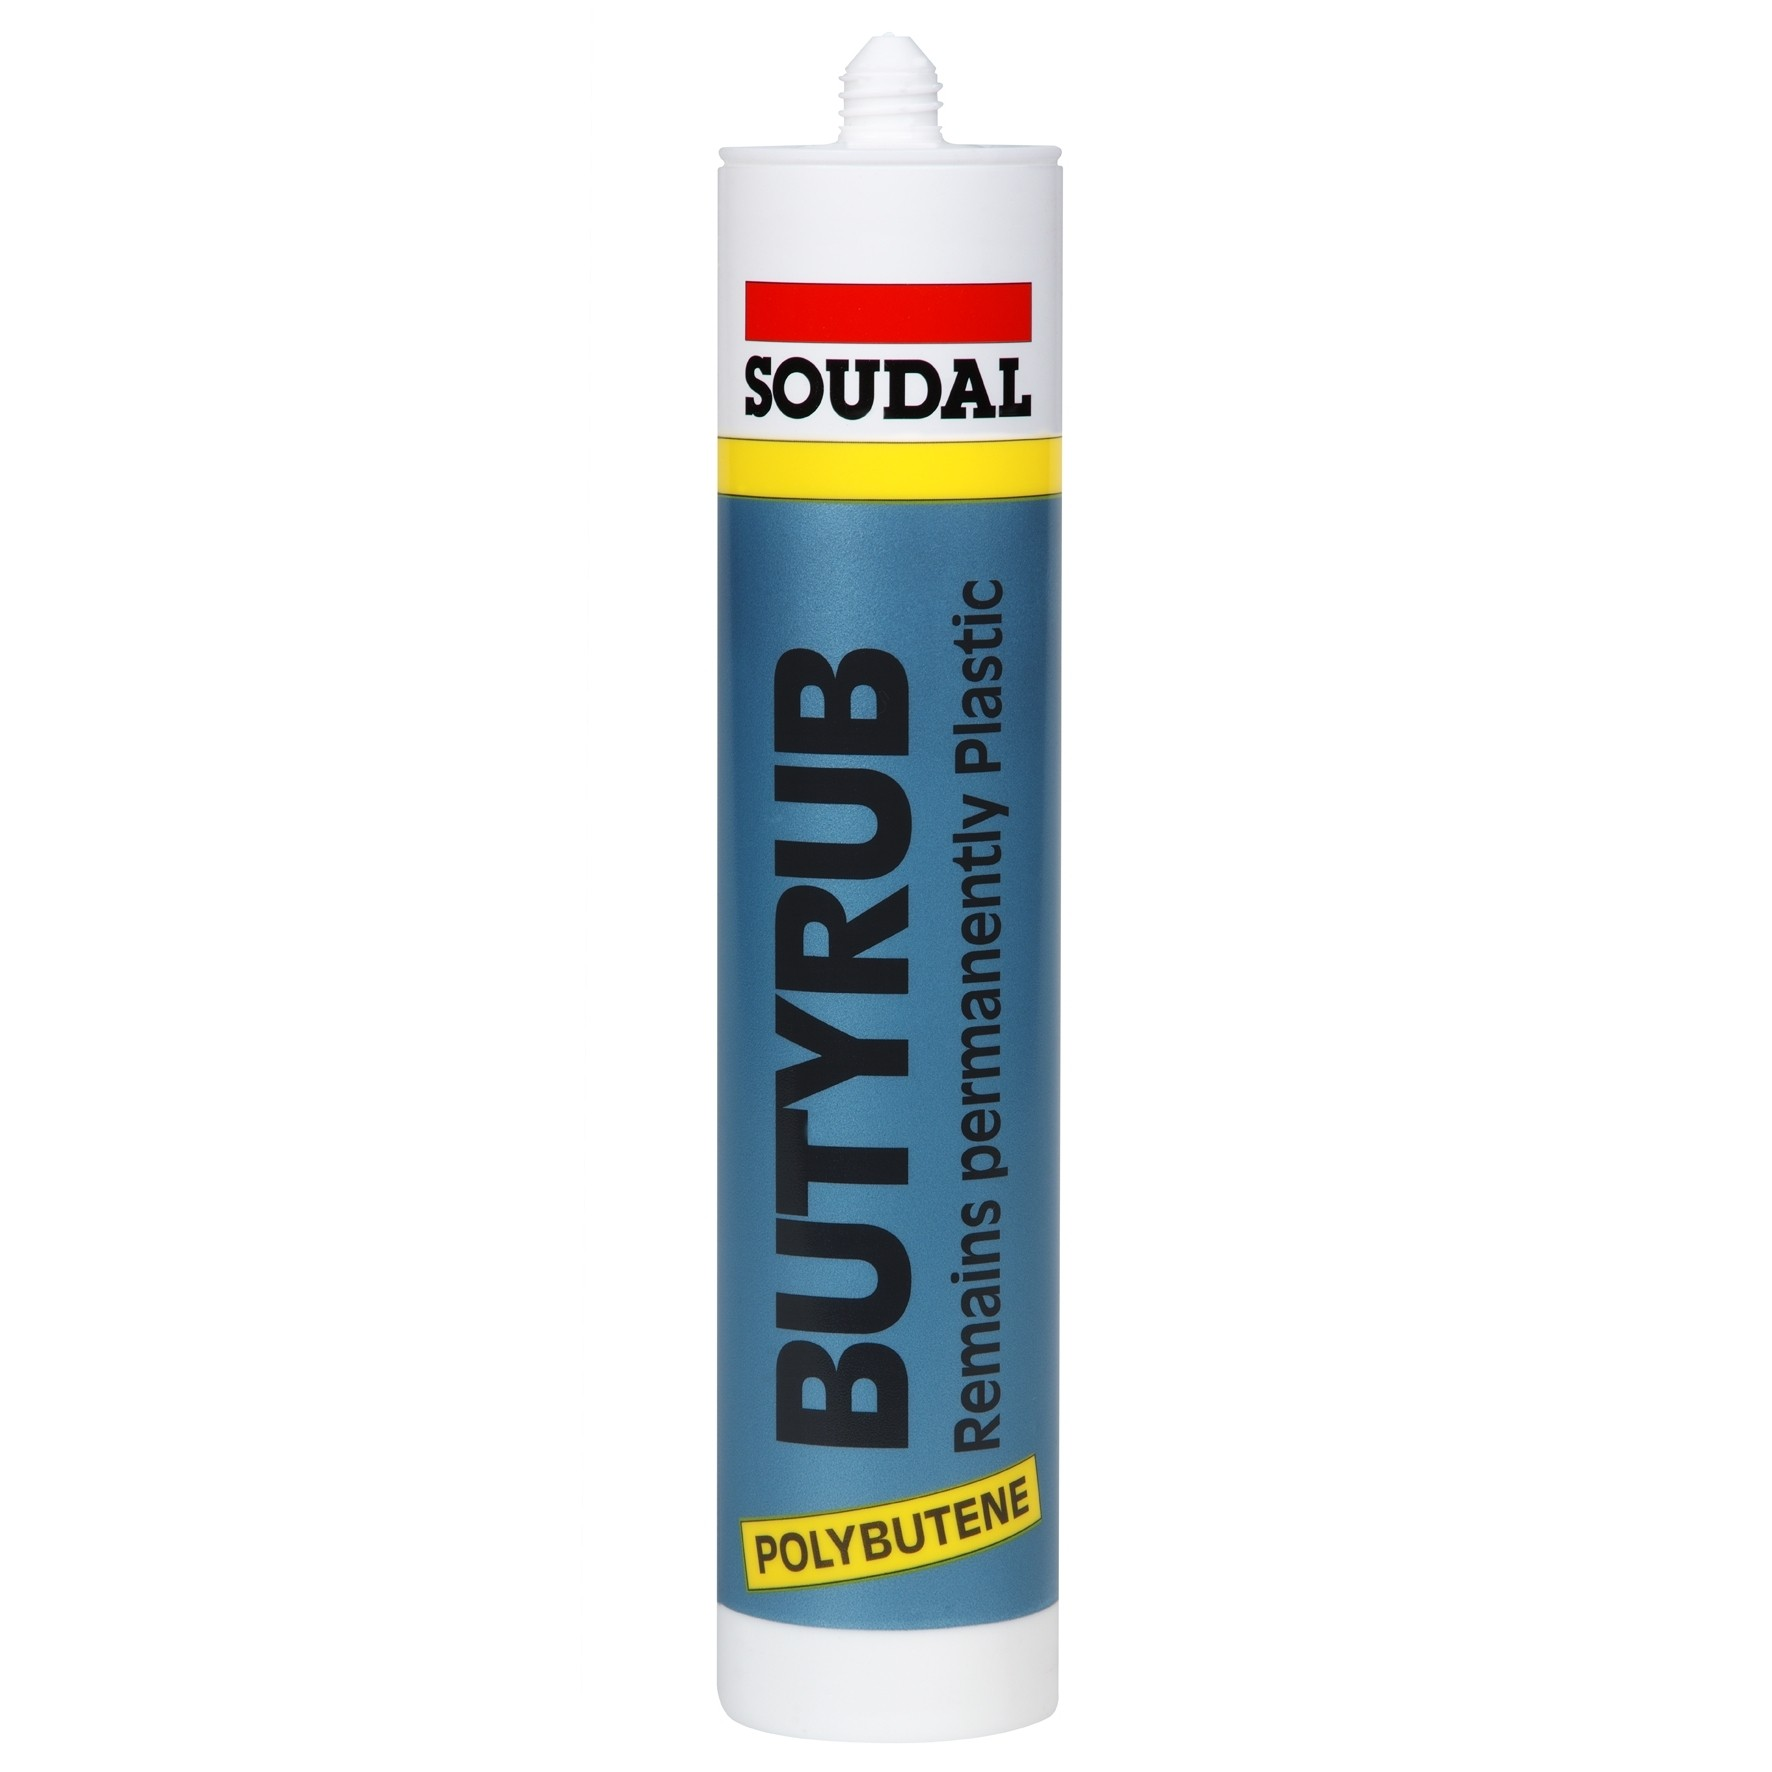 Soudal Butyrub Mastic Grey Sealant 310ml